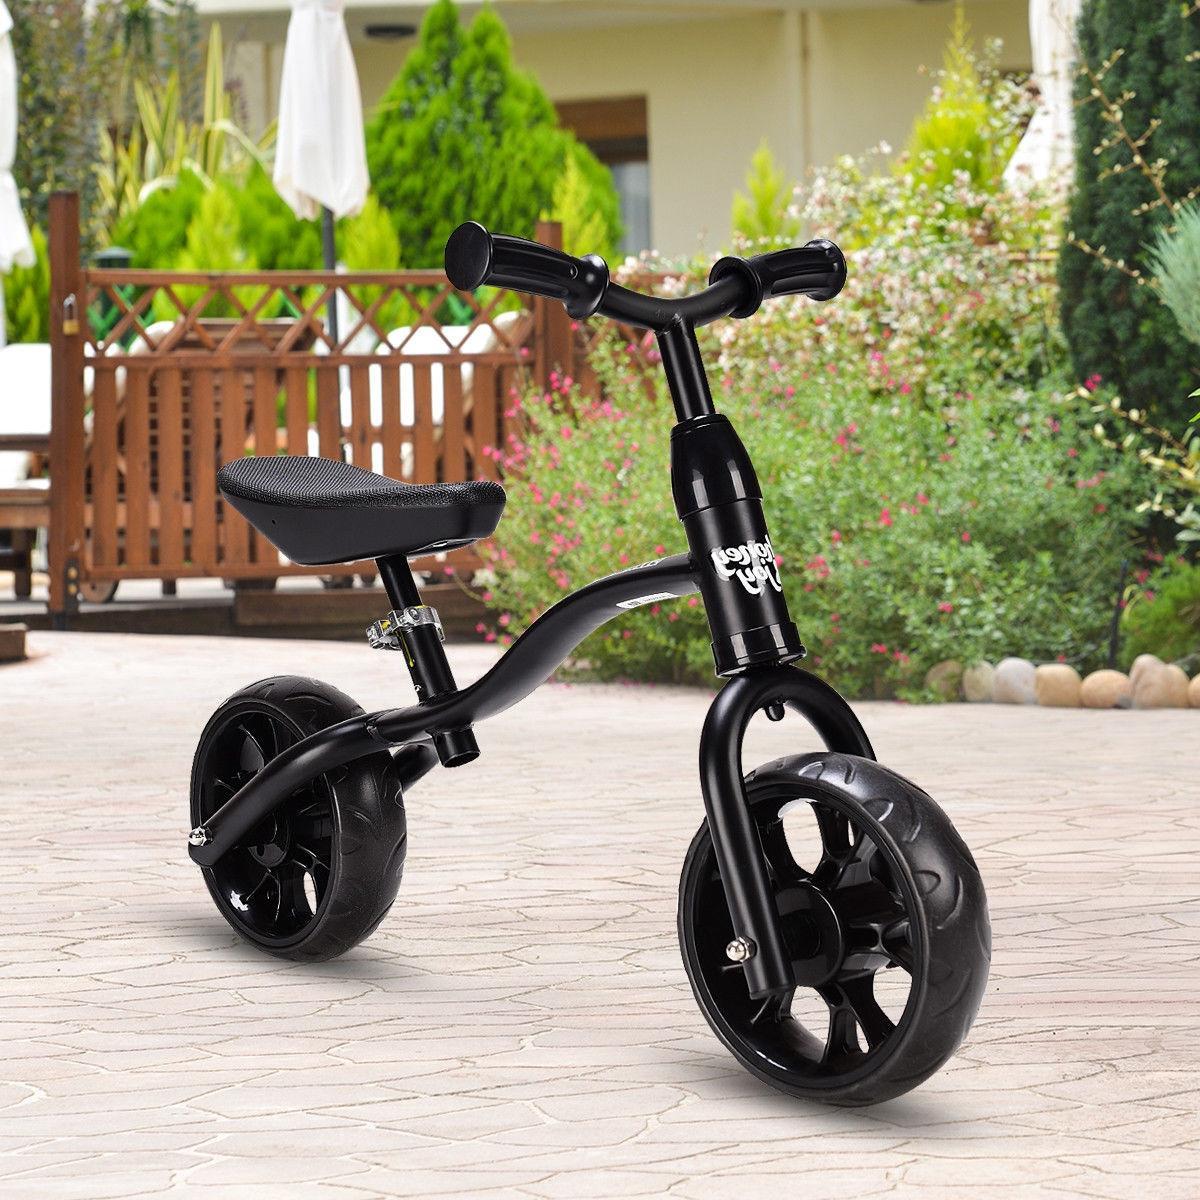 Kids Balance No-Pedal Child Training Bicycle w/ Adjustable Seat Black